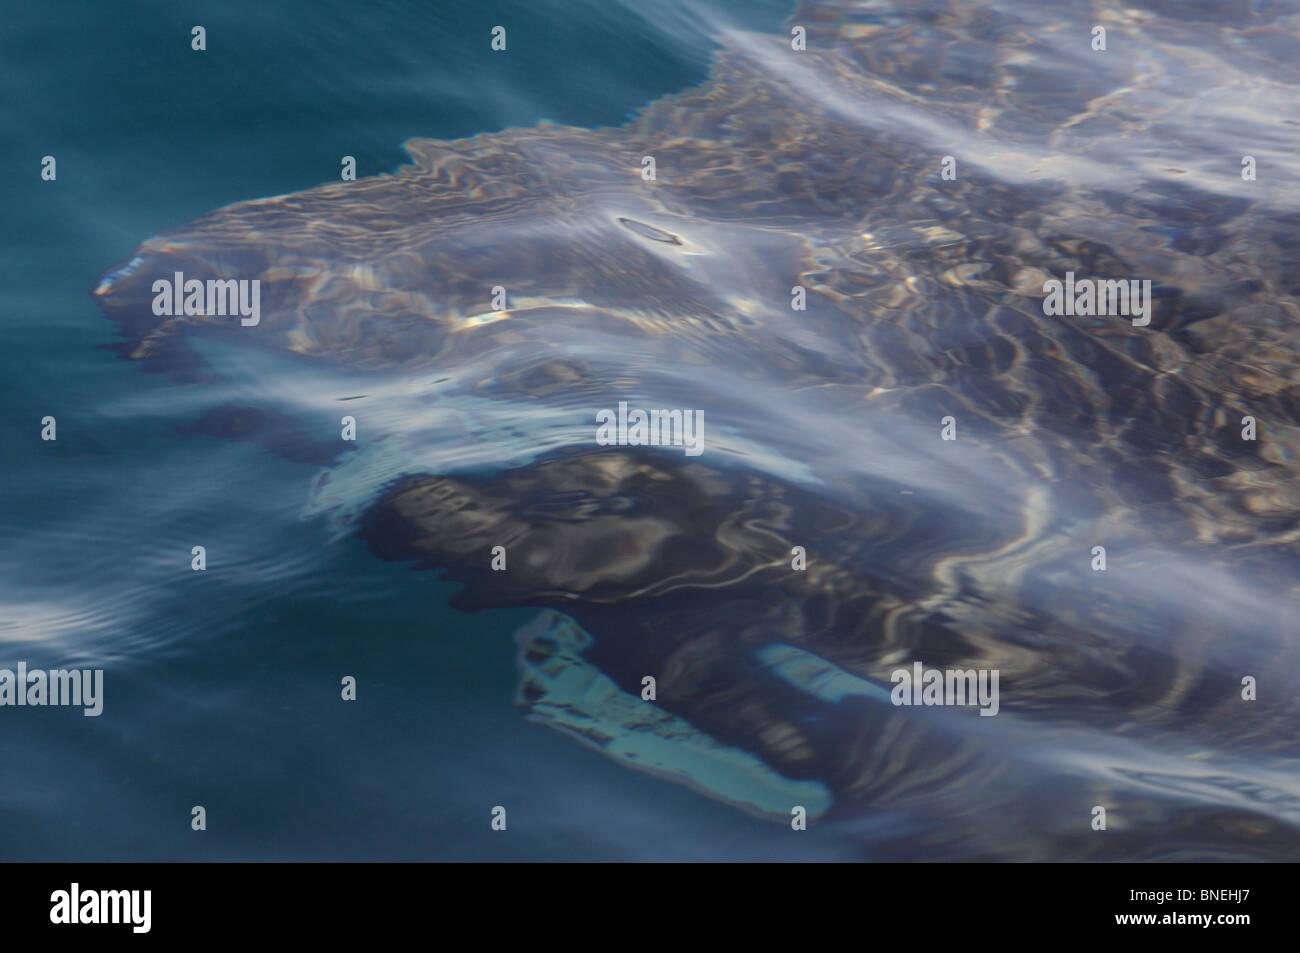 Basking shark near Skerryvore Lighthouse (11 miles SW of Tiree), Atlantic Ocean, Scotland - Stock Image